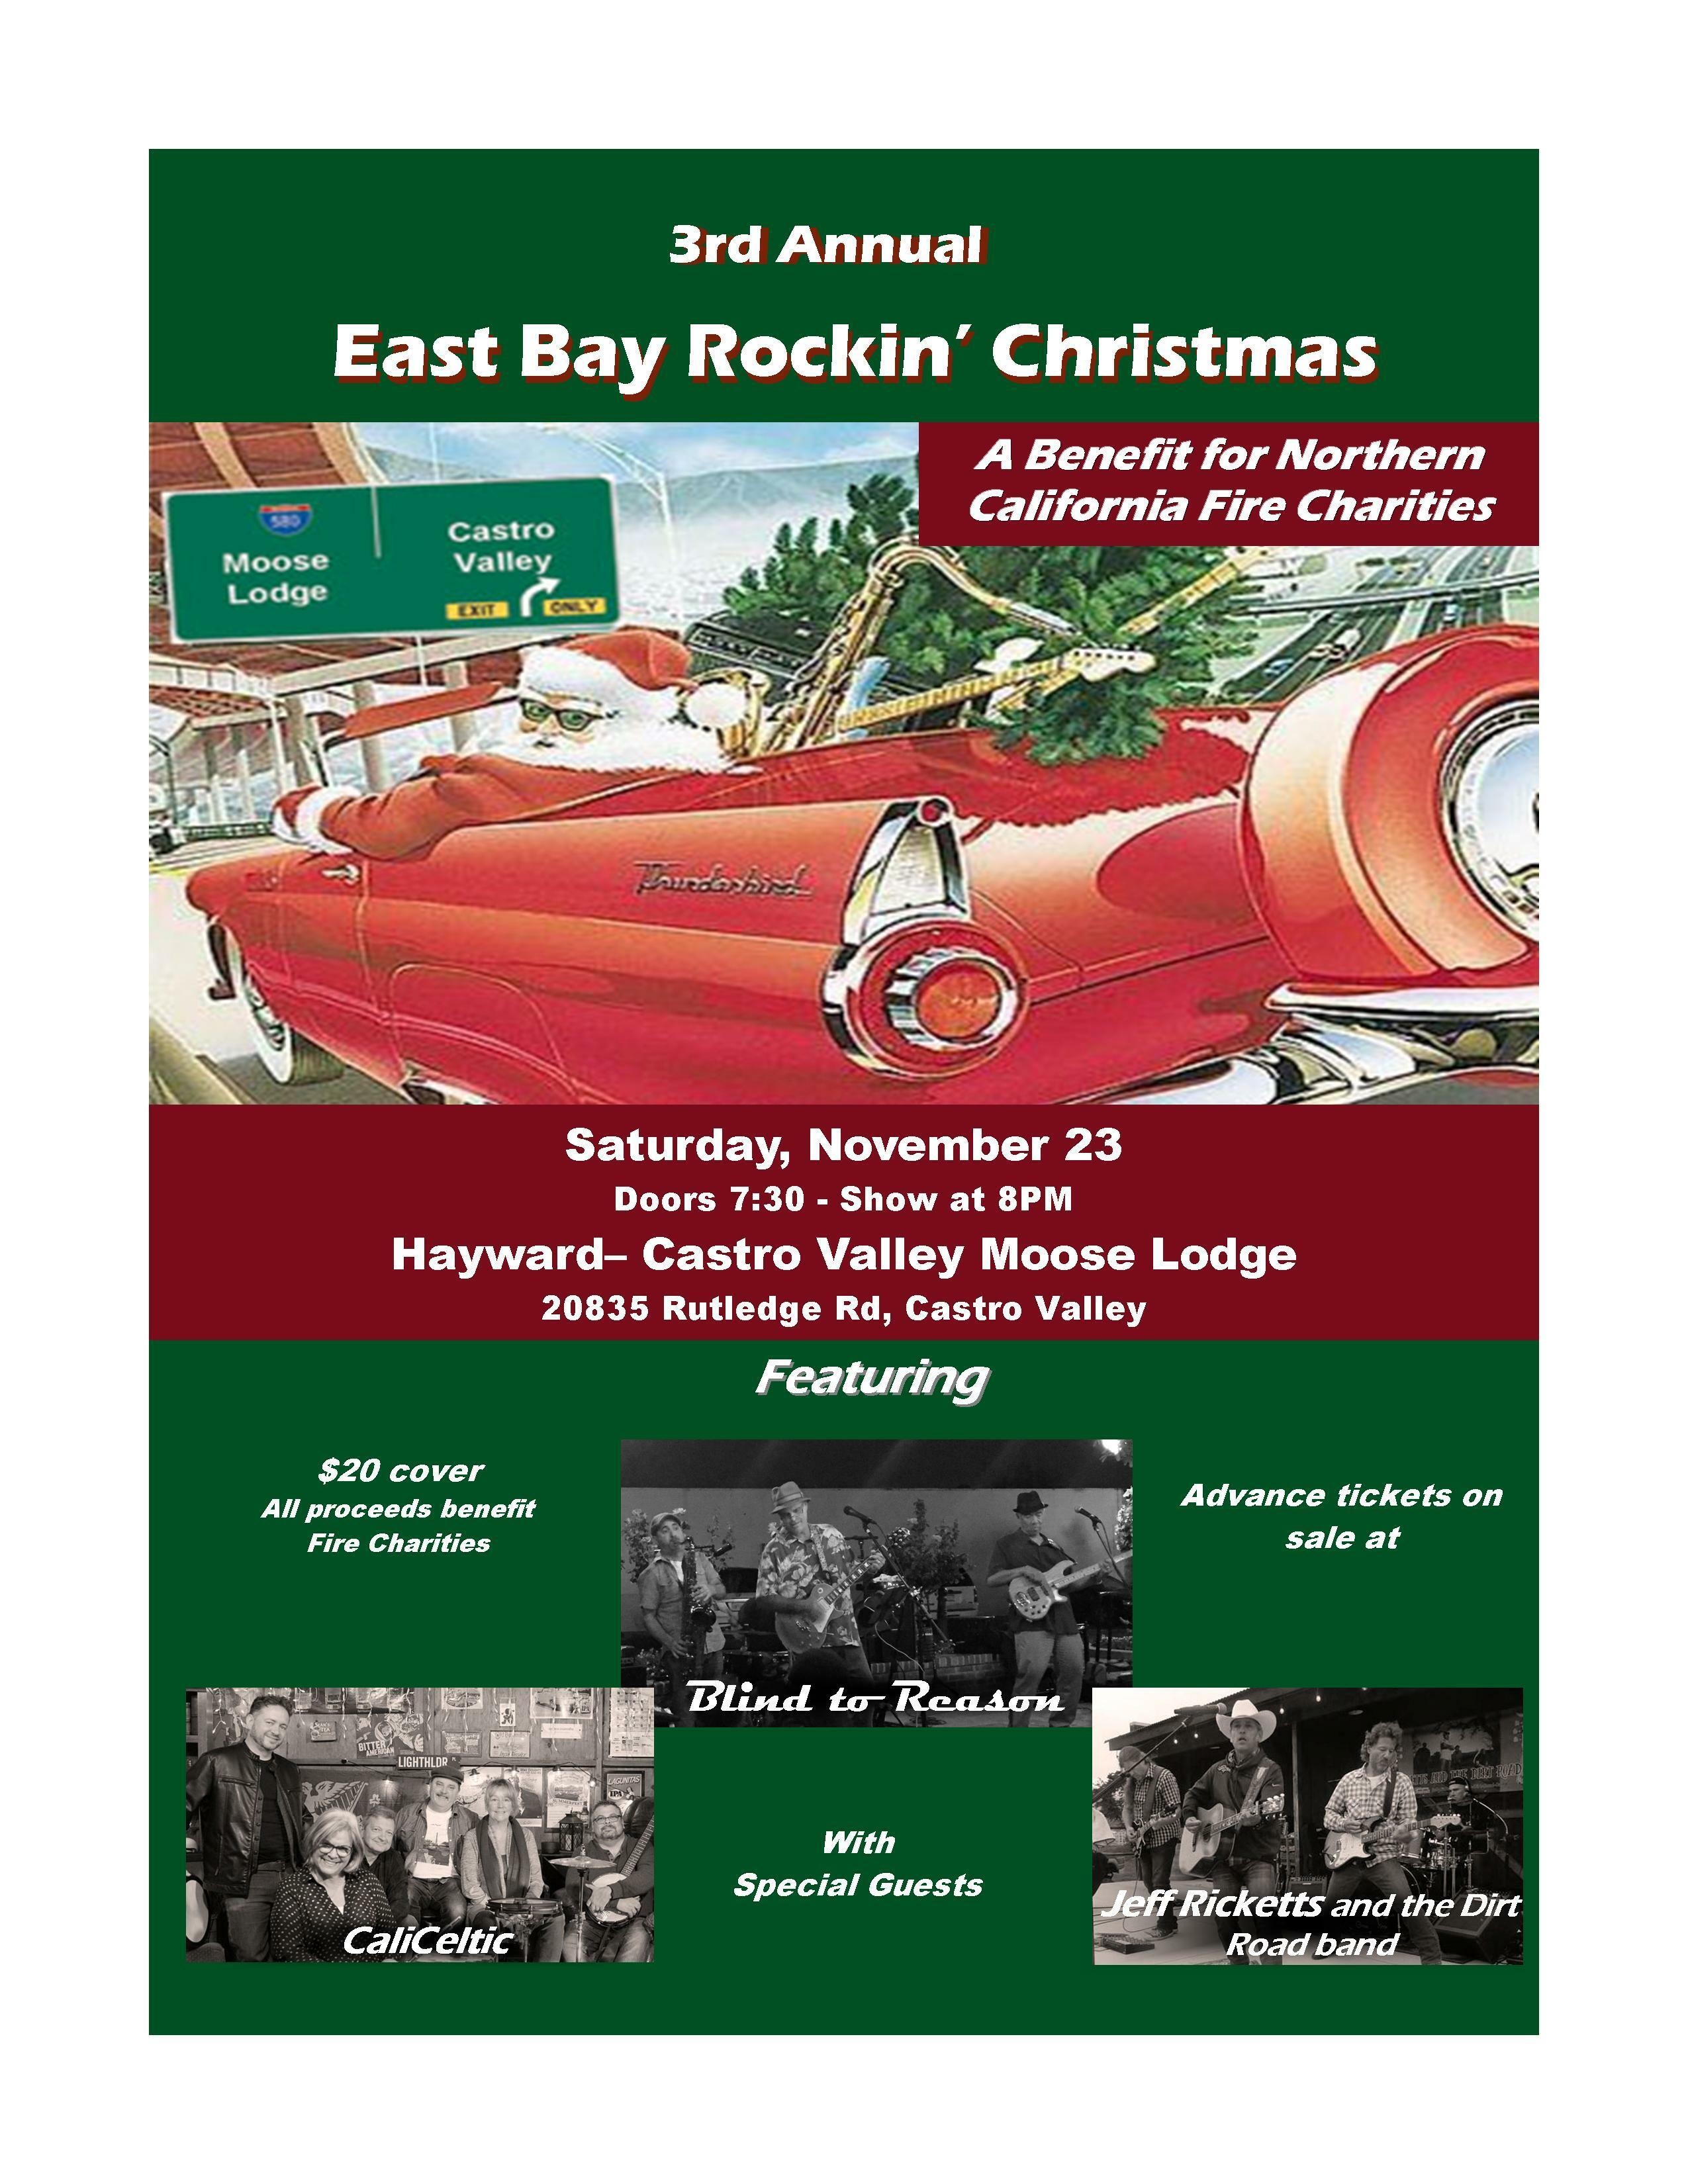 East Bay Rockin' Christmas 2019 Advance Ticket 00002